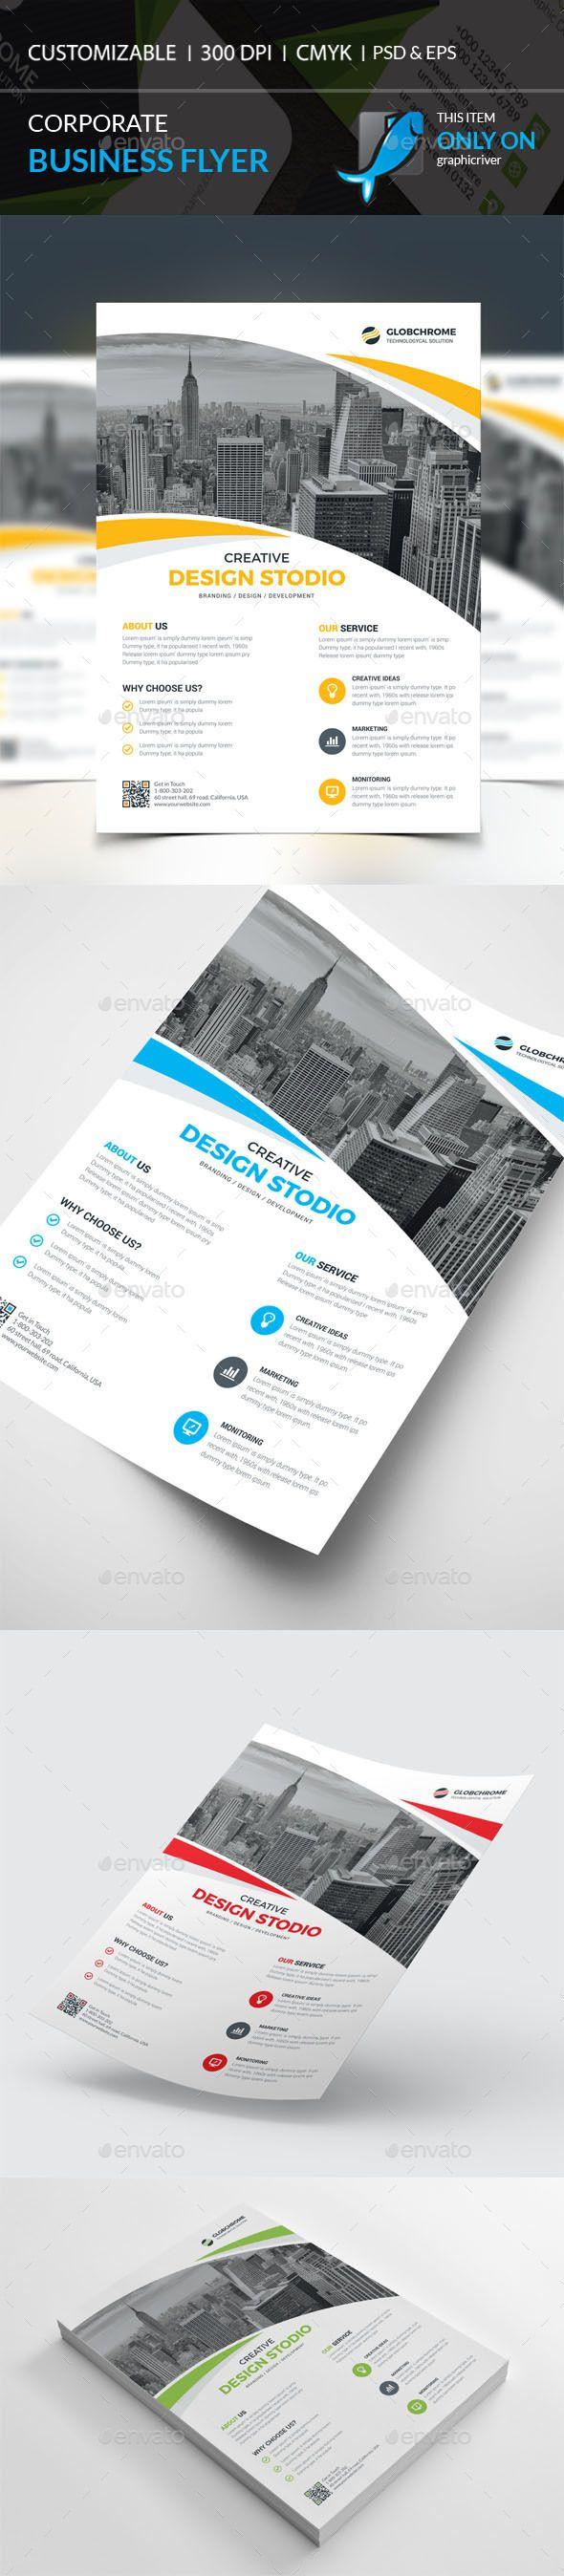 Corporate Flyer Template PSD #design Download: http://graphicriver.net/item/corporate-flyer/14109918?ref=ksioks